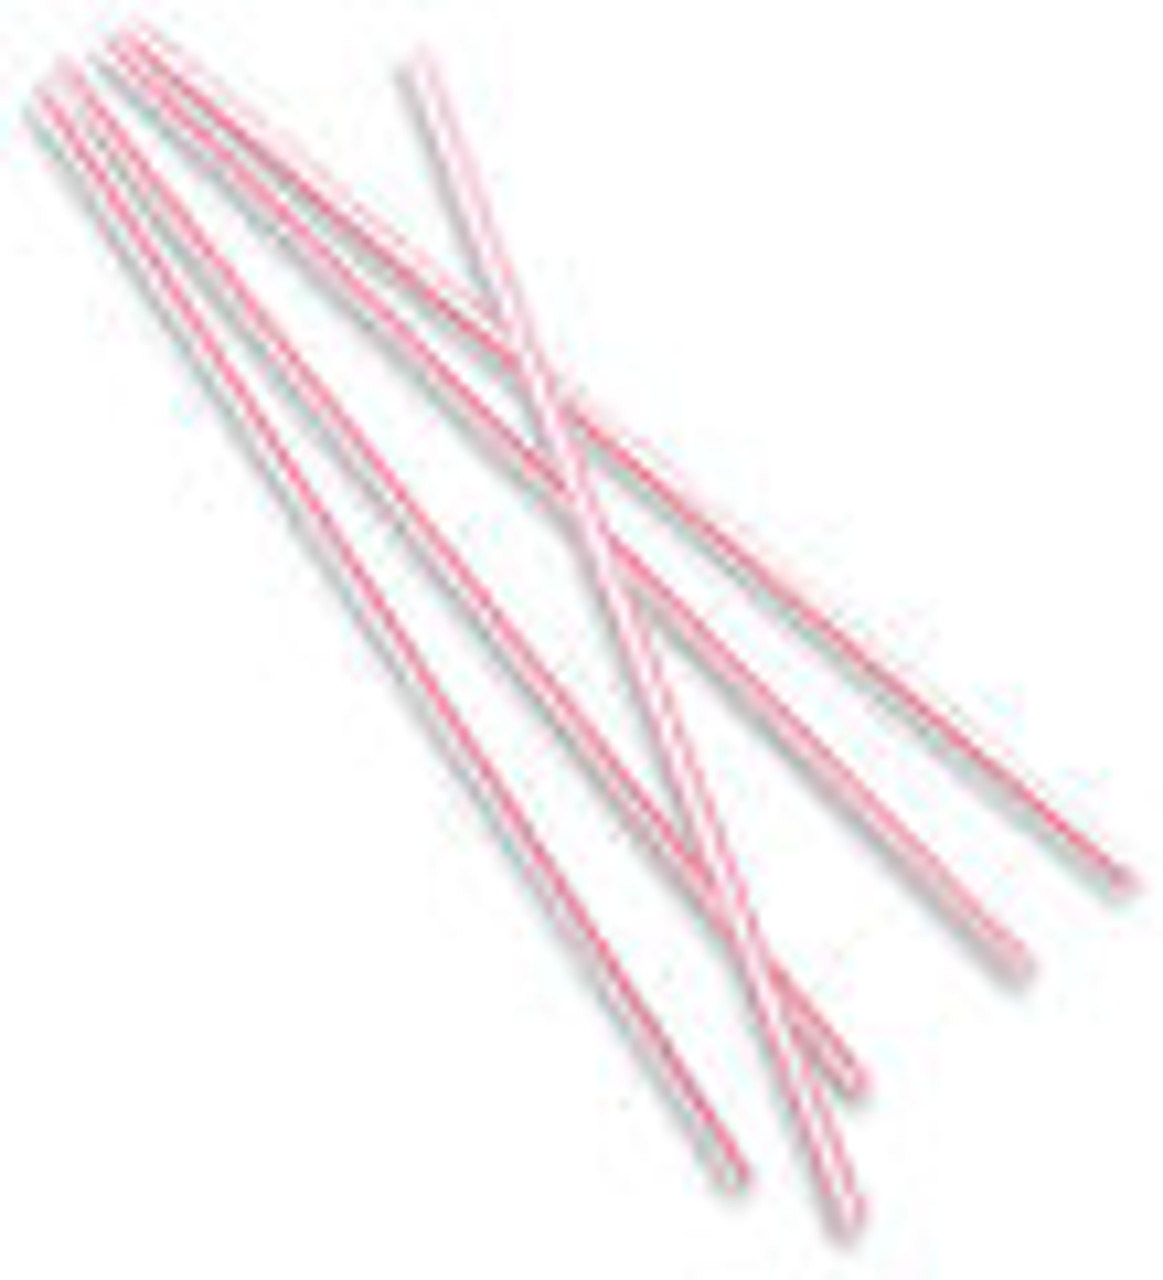 Sip Stick Straws